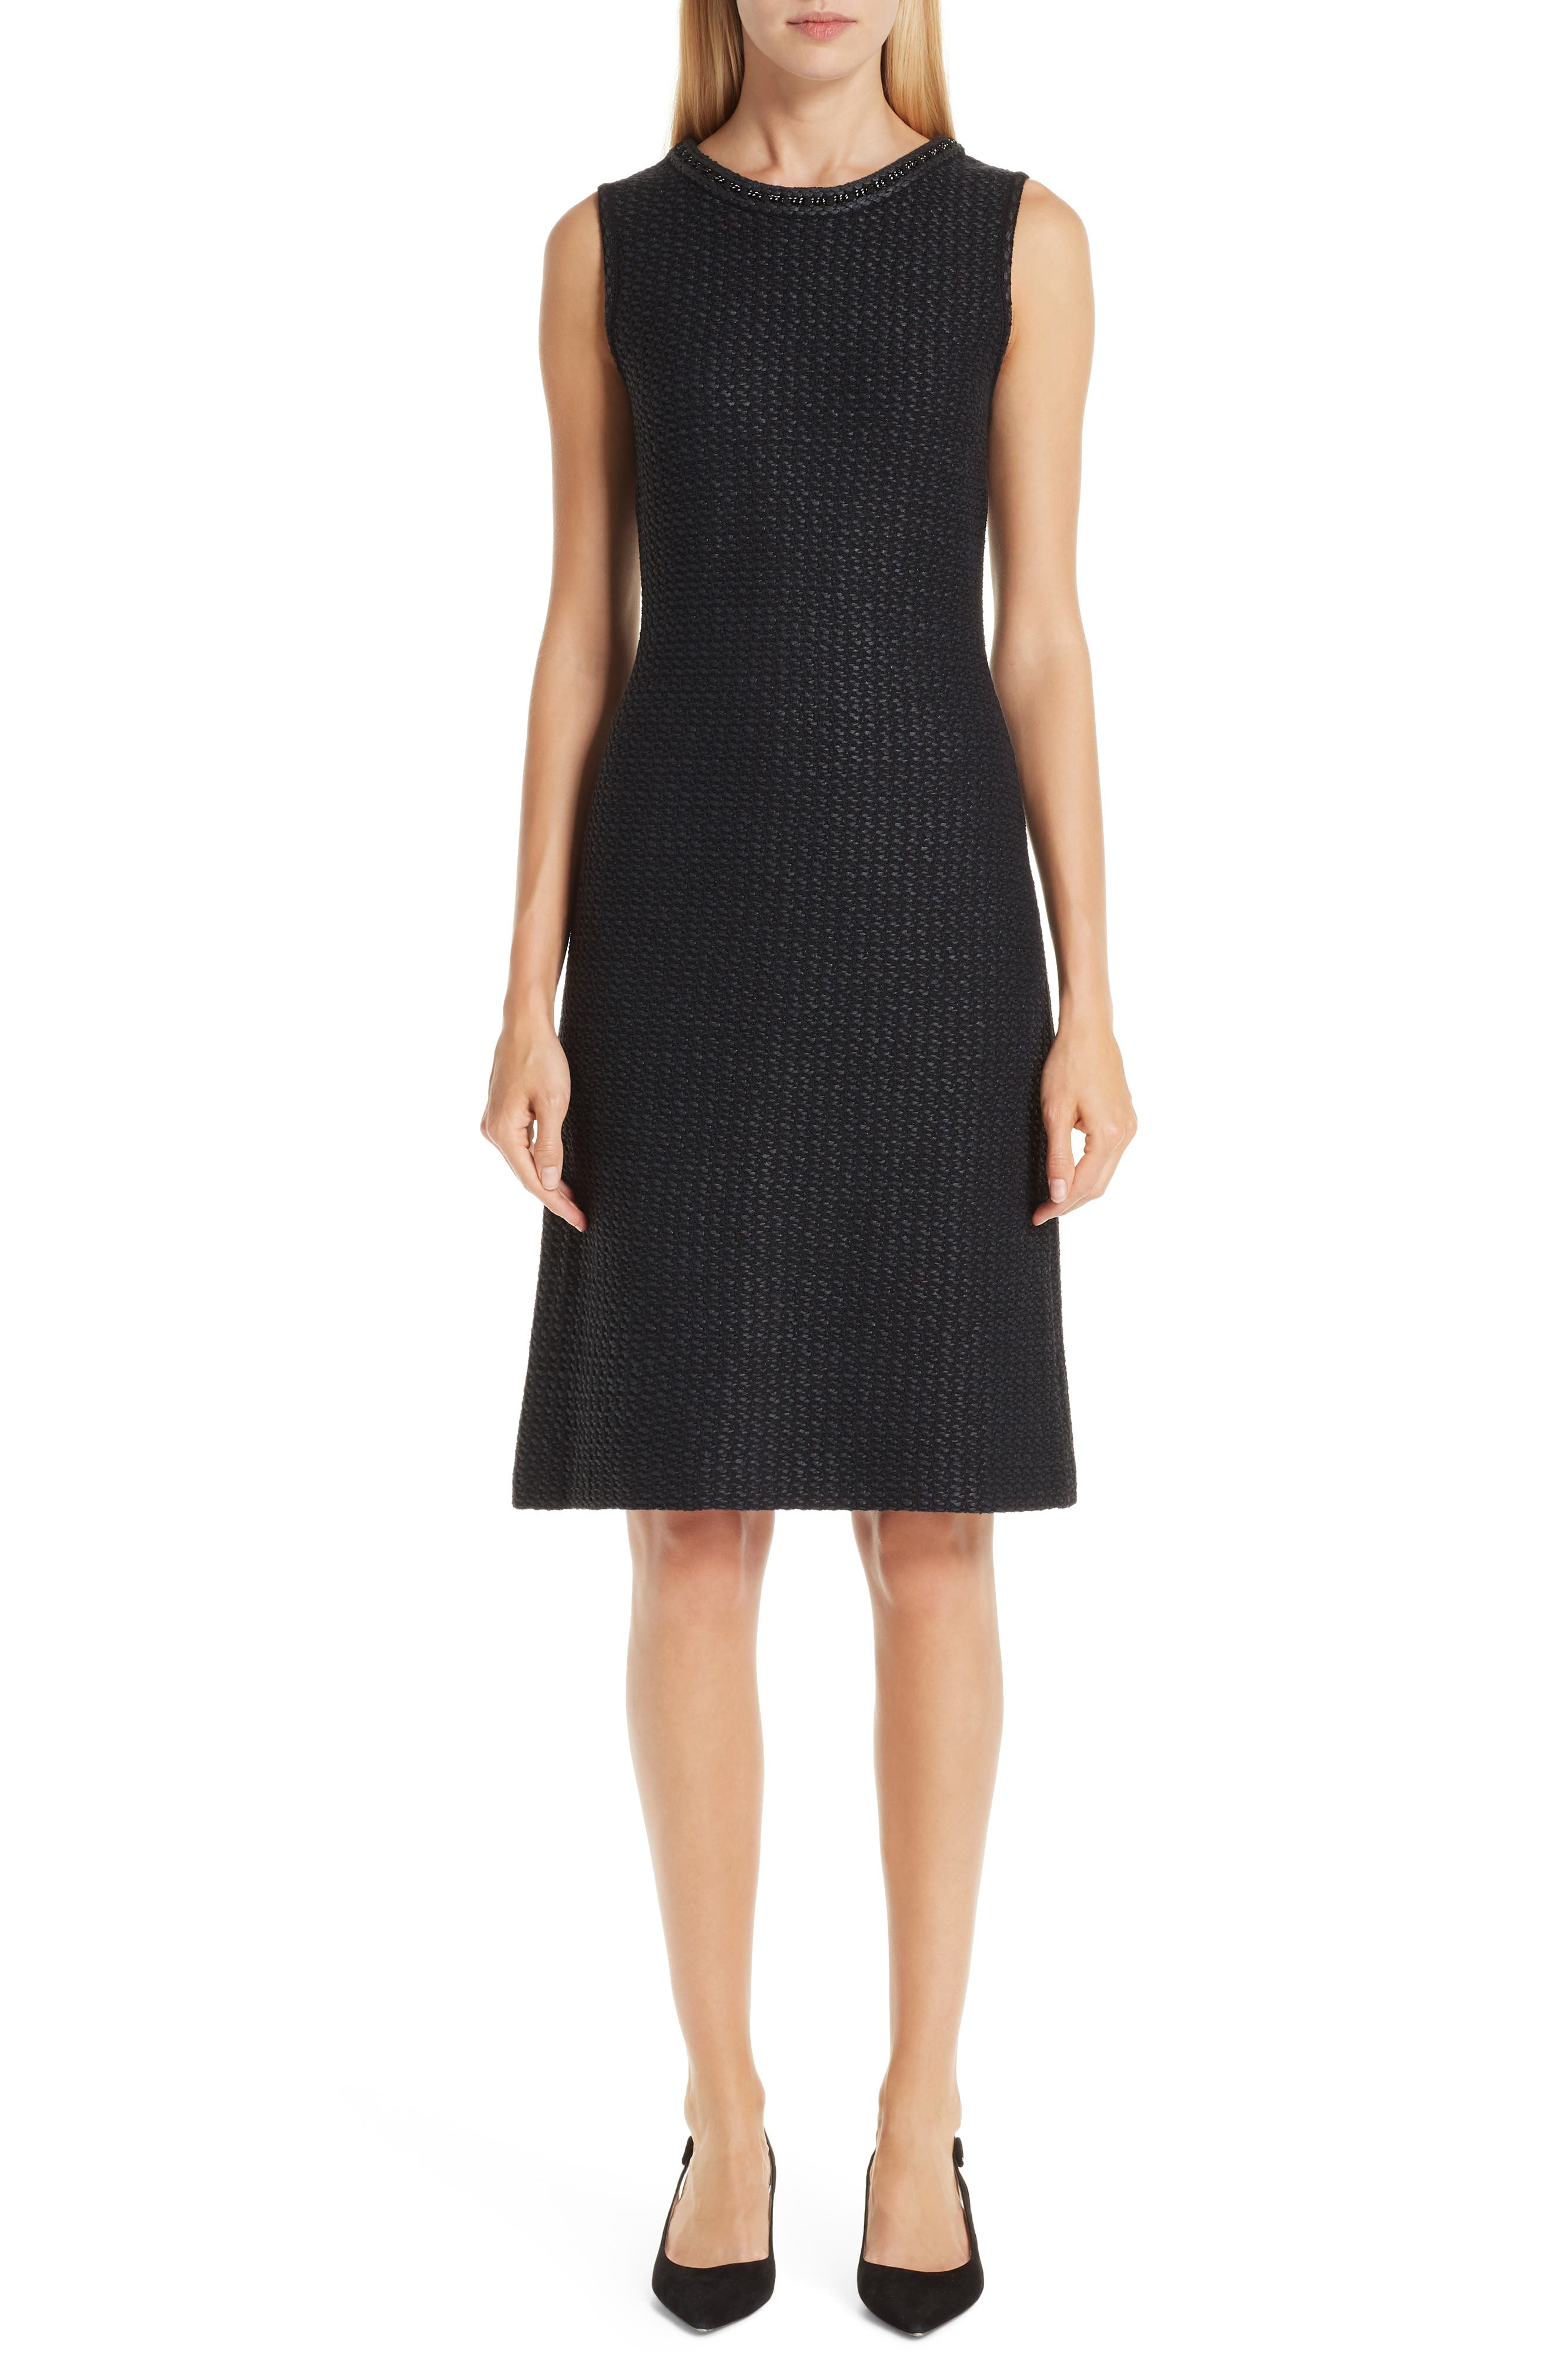 St. John Collection Adina Chain Trim Knit Dress, Black